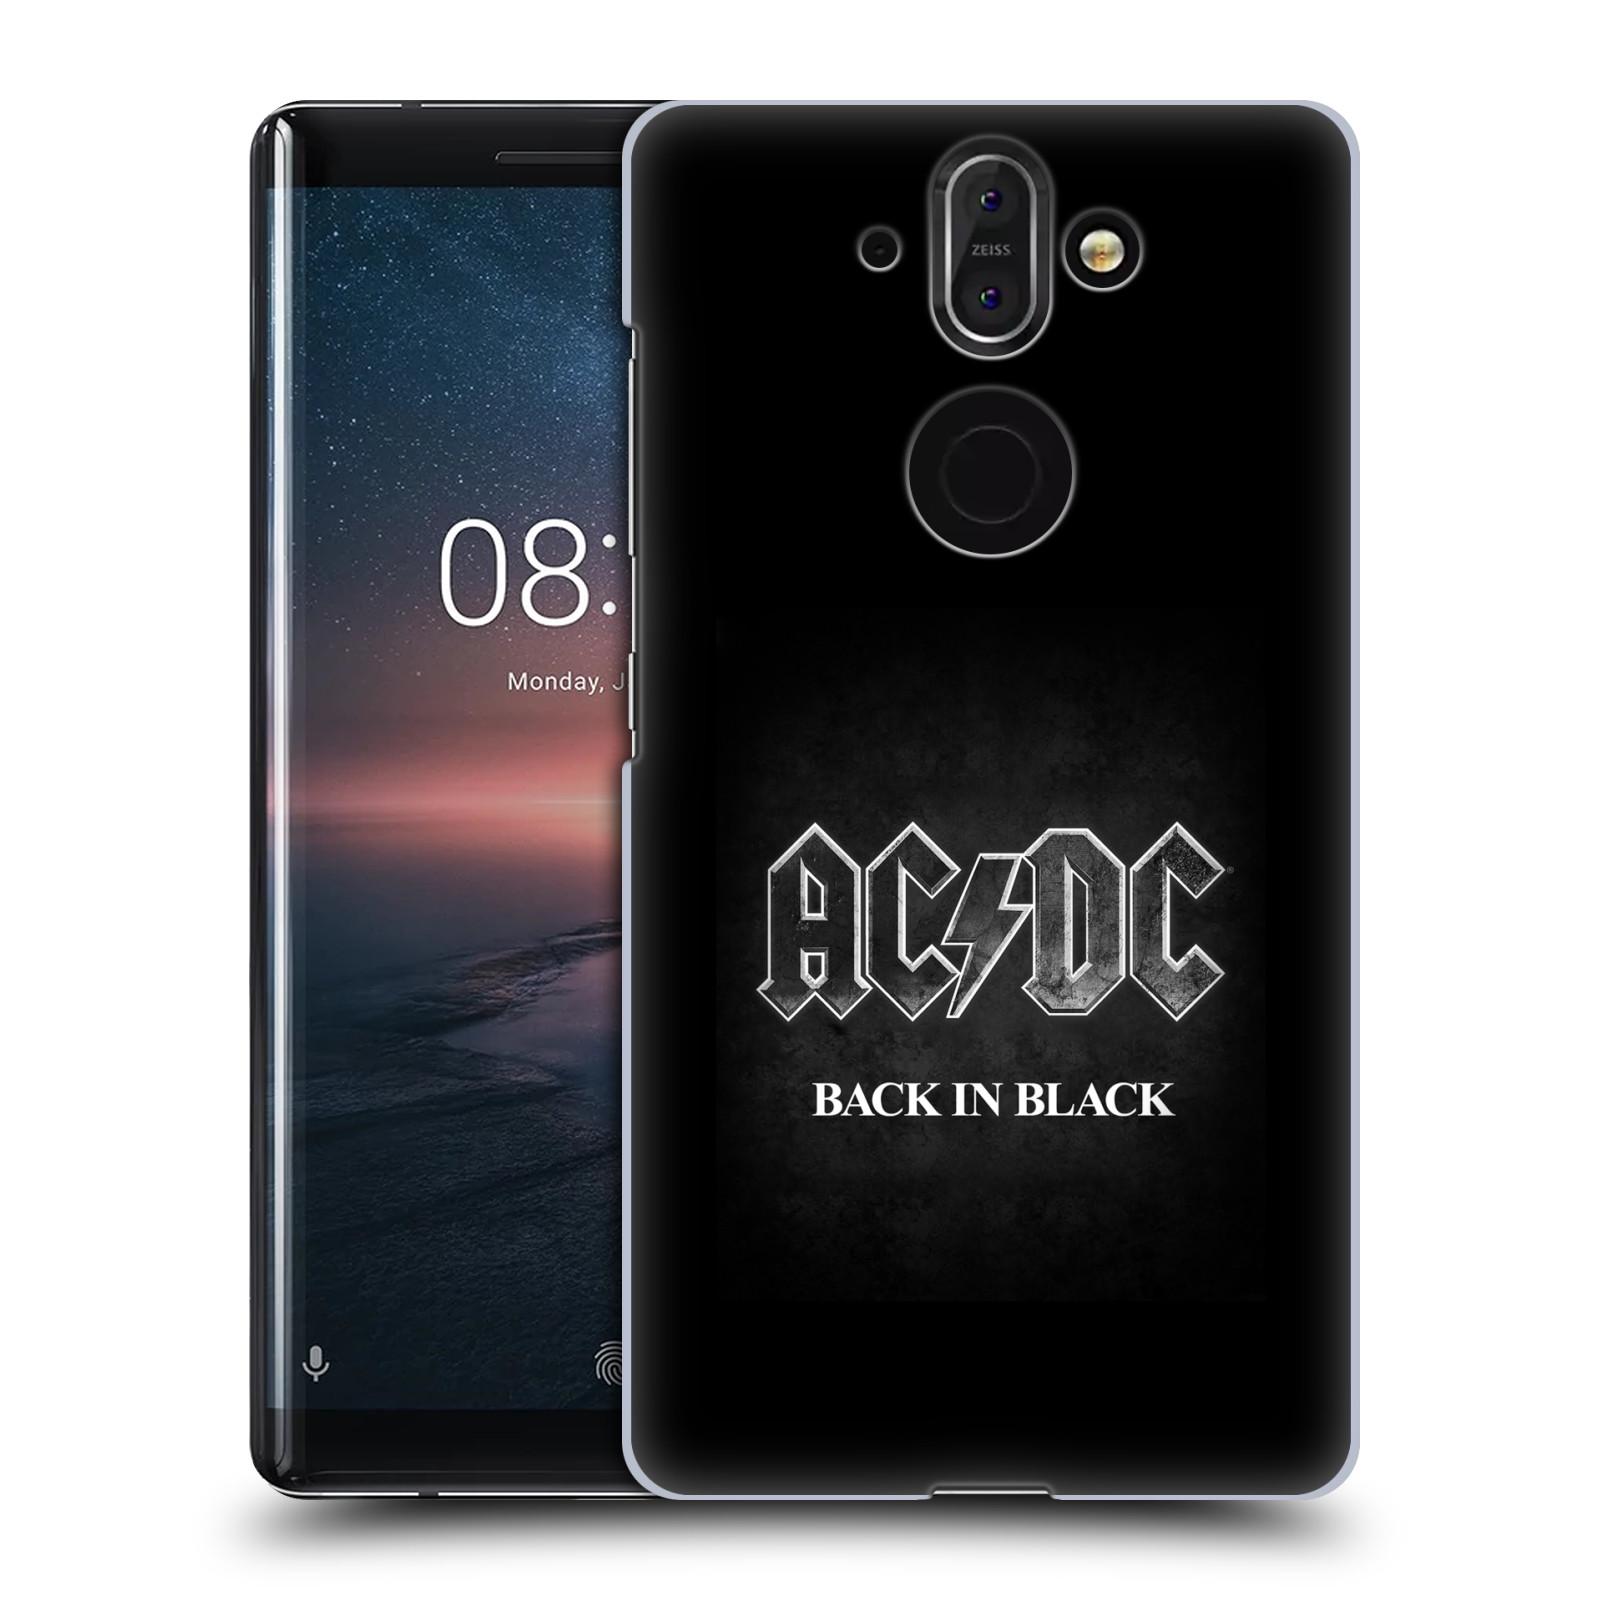 Plastové pouzdro na mobil Nokia 8 Sirocco - Head Case - AC/DC BACK IN BLACK